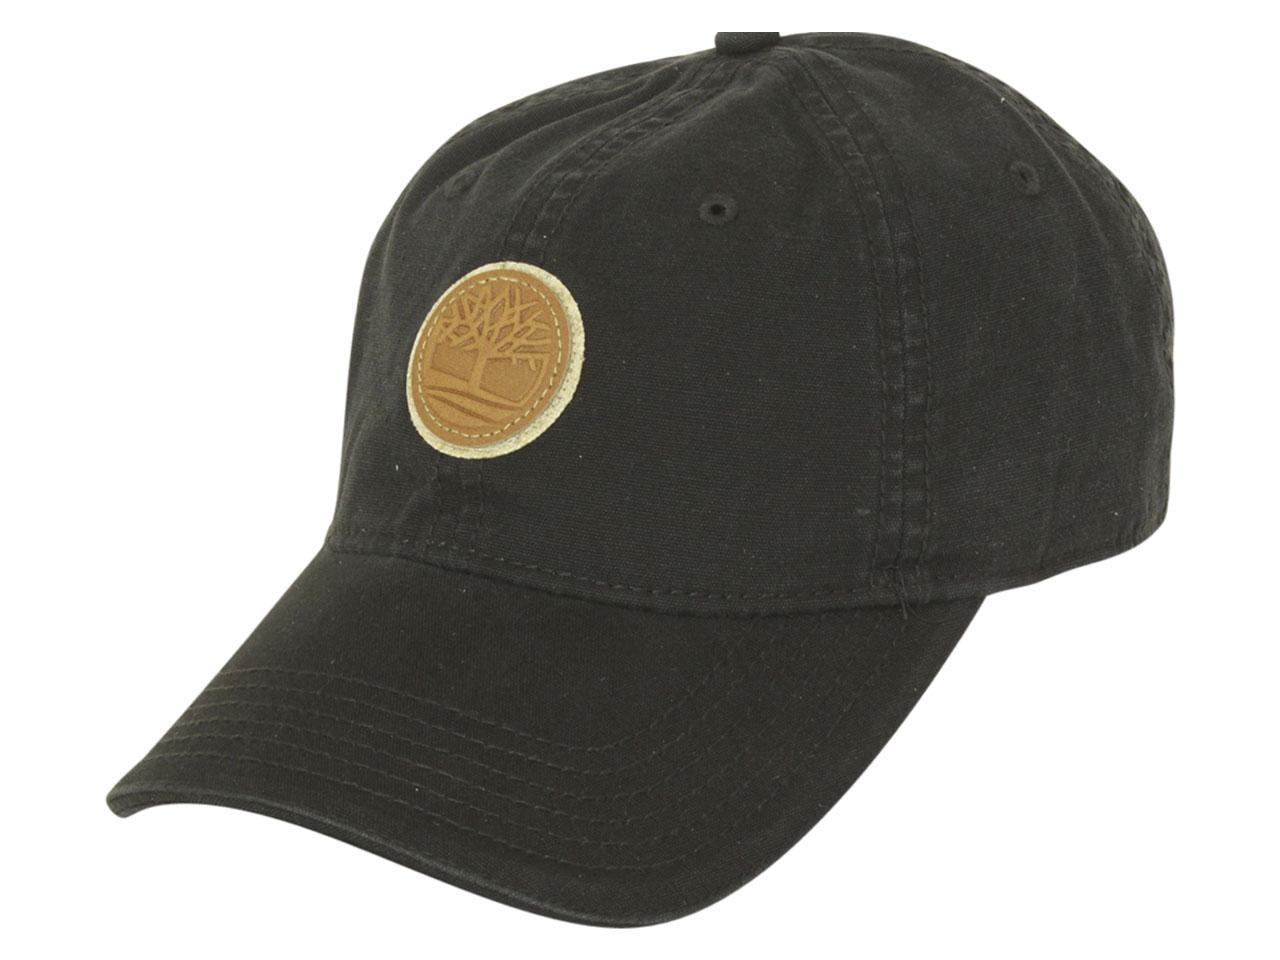 59fc3695 Timberland Men's Rye Beach Cotton Canvas Strapback Baseball Cap Hat